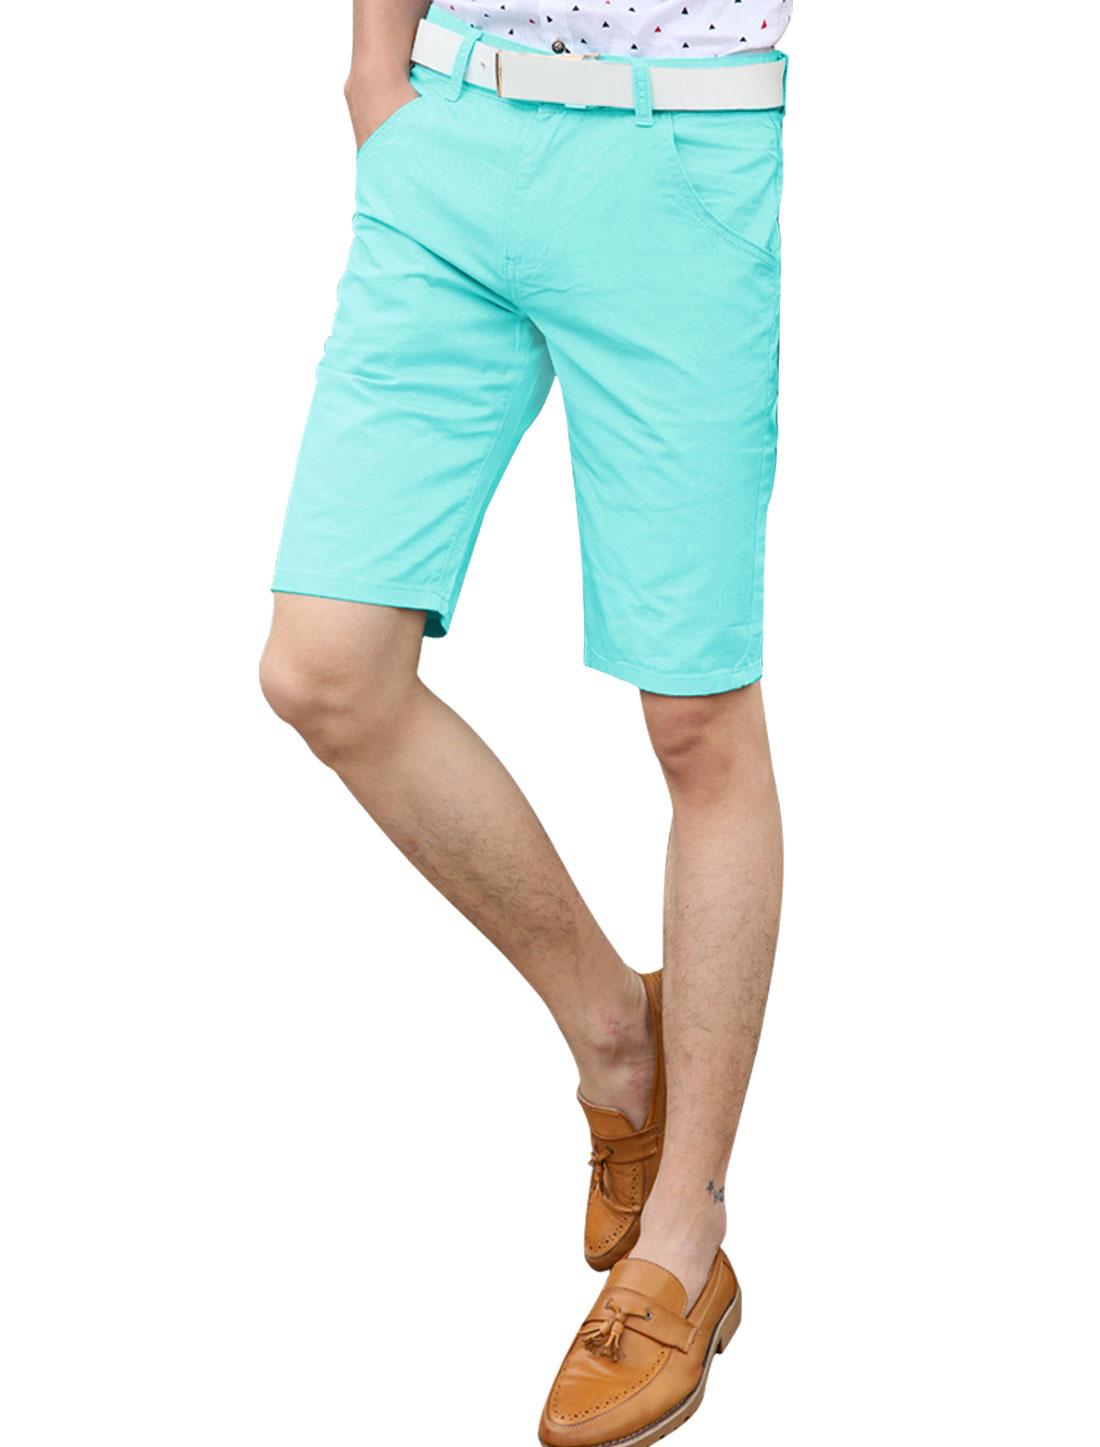 Man Natural Waist Two Hip Pockets Straight Casual Shorts Aqua W30